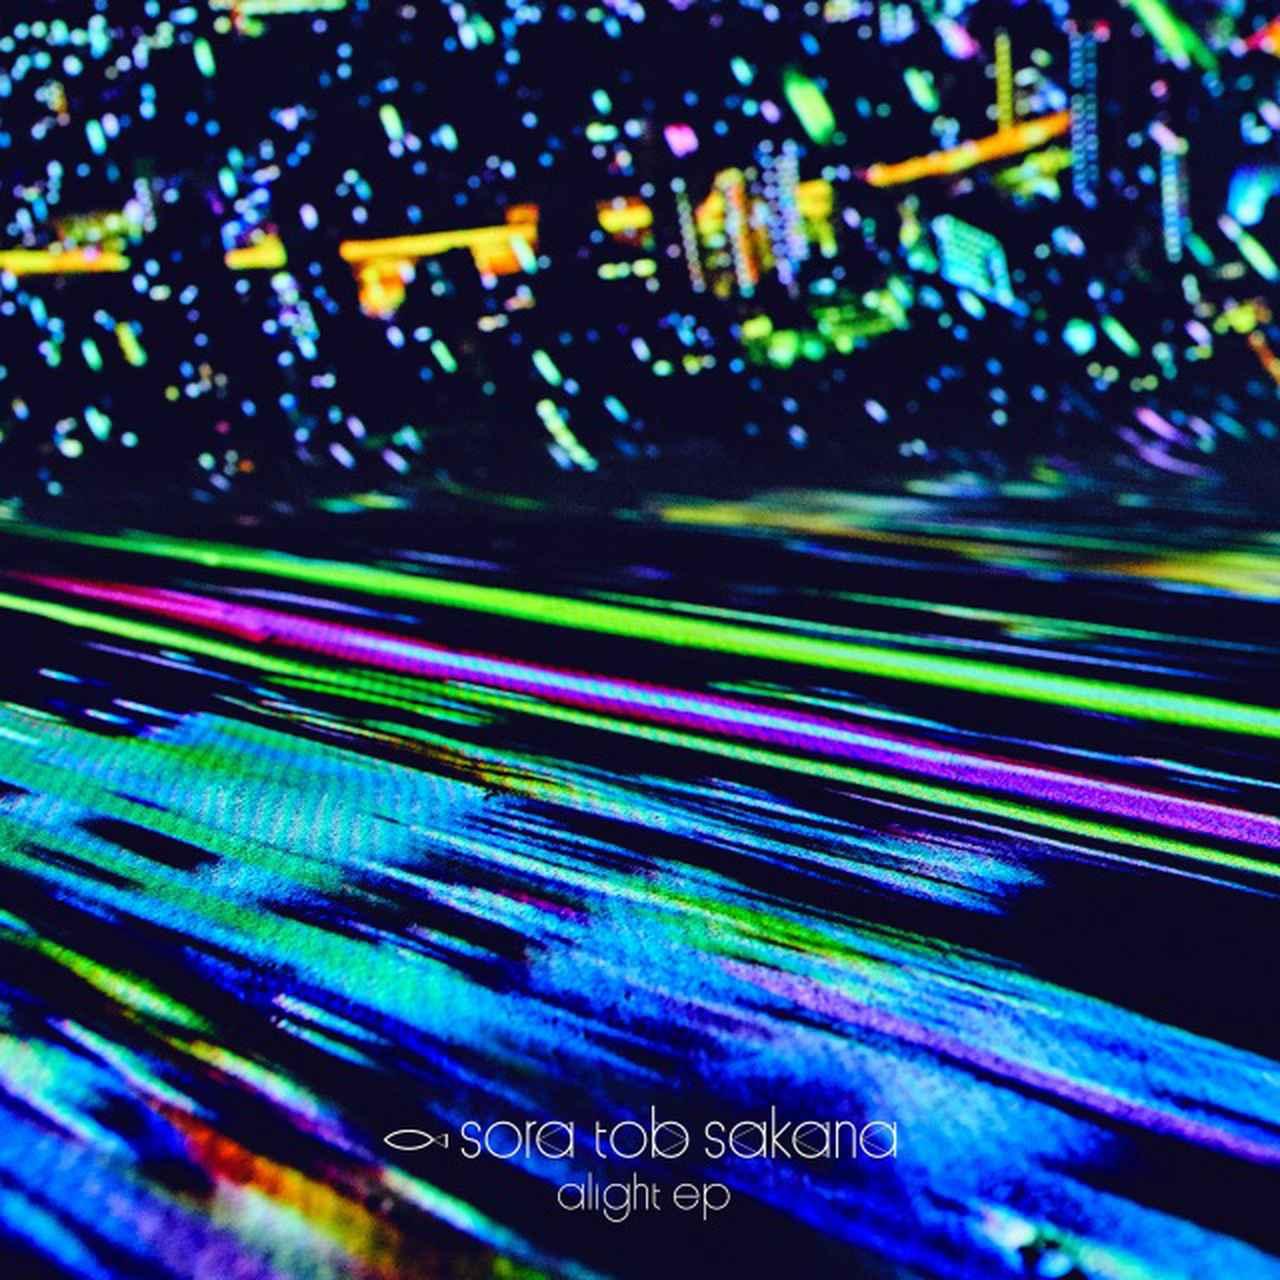 画像: alight ep / sora tob sakana on OTOTOY Music Store